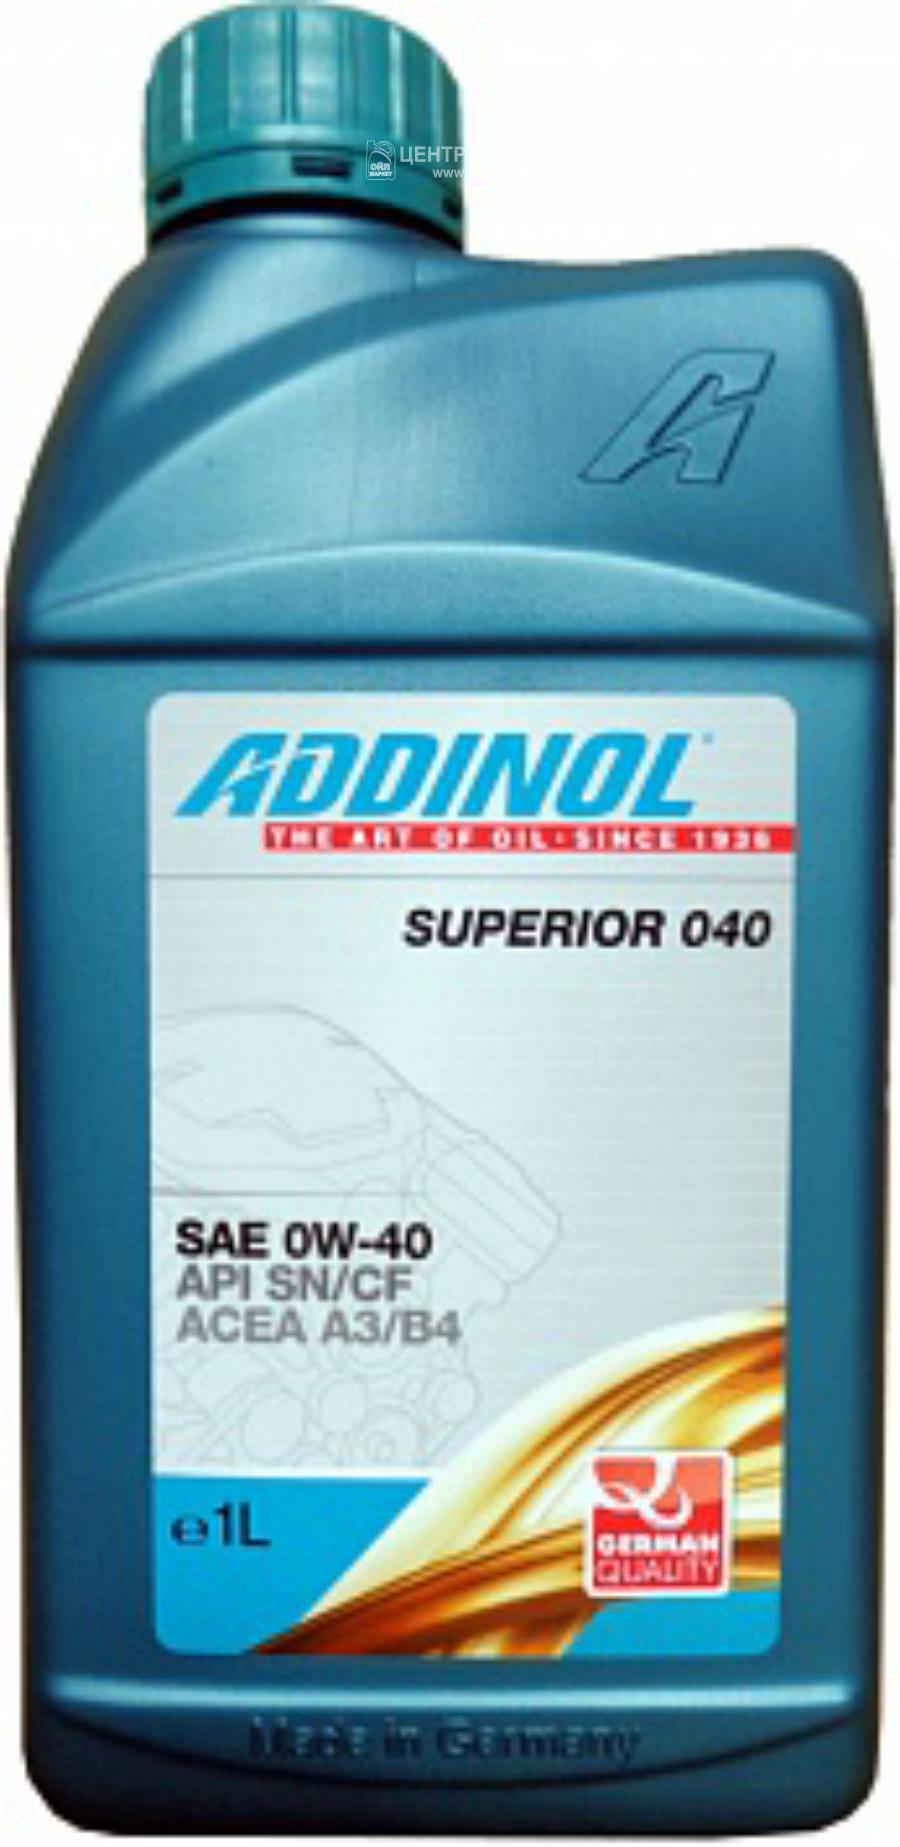 Масло моторное синтетическое Superior 040 0W-40, 1л